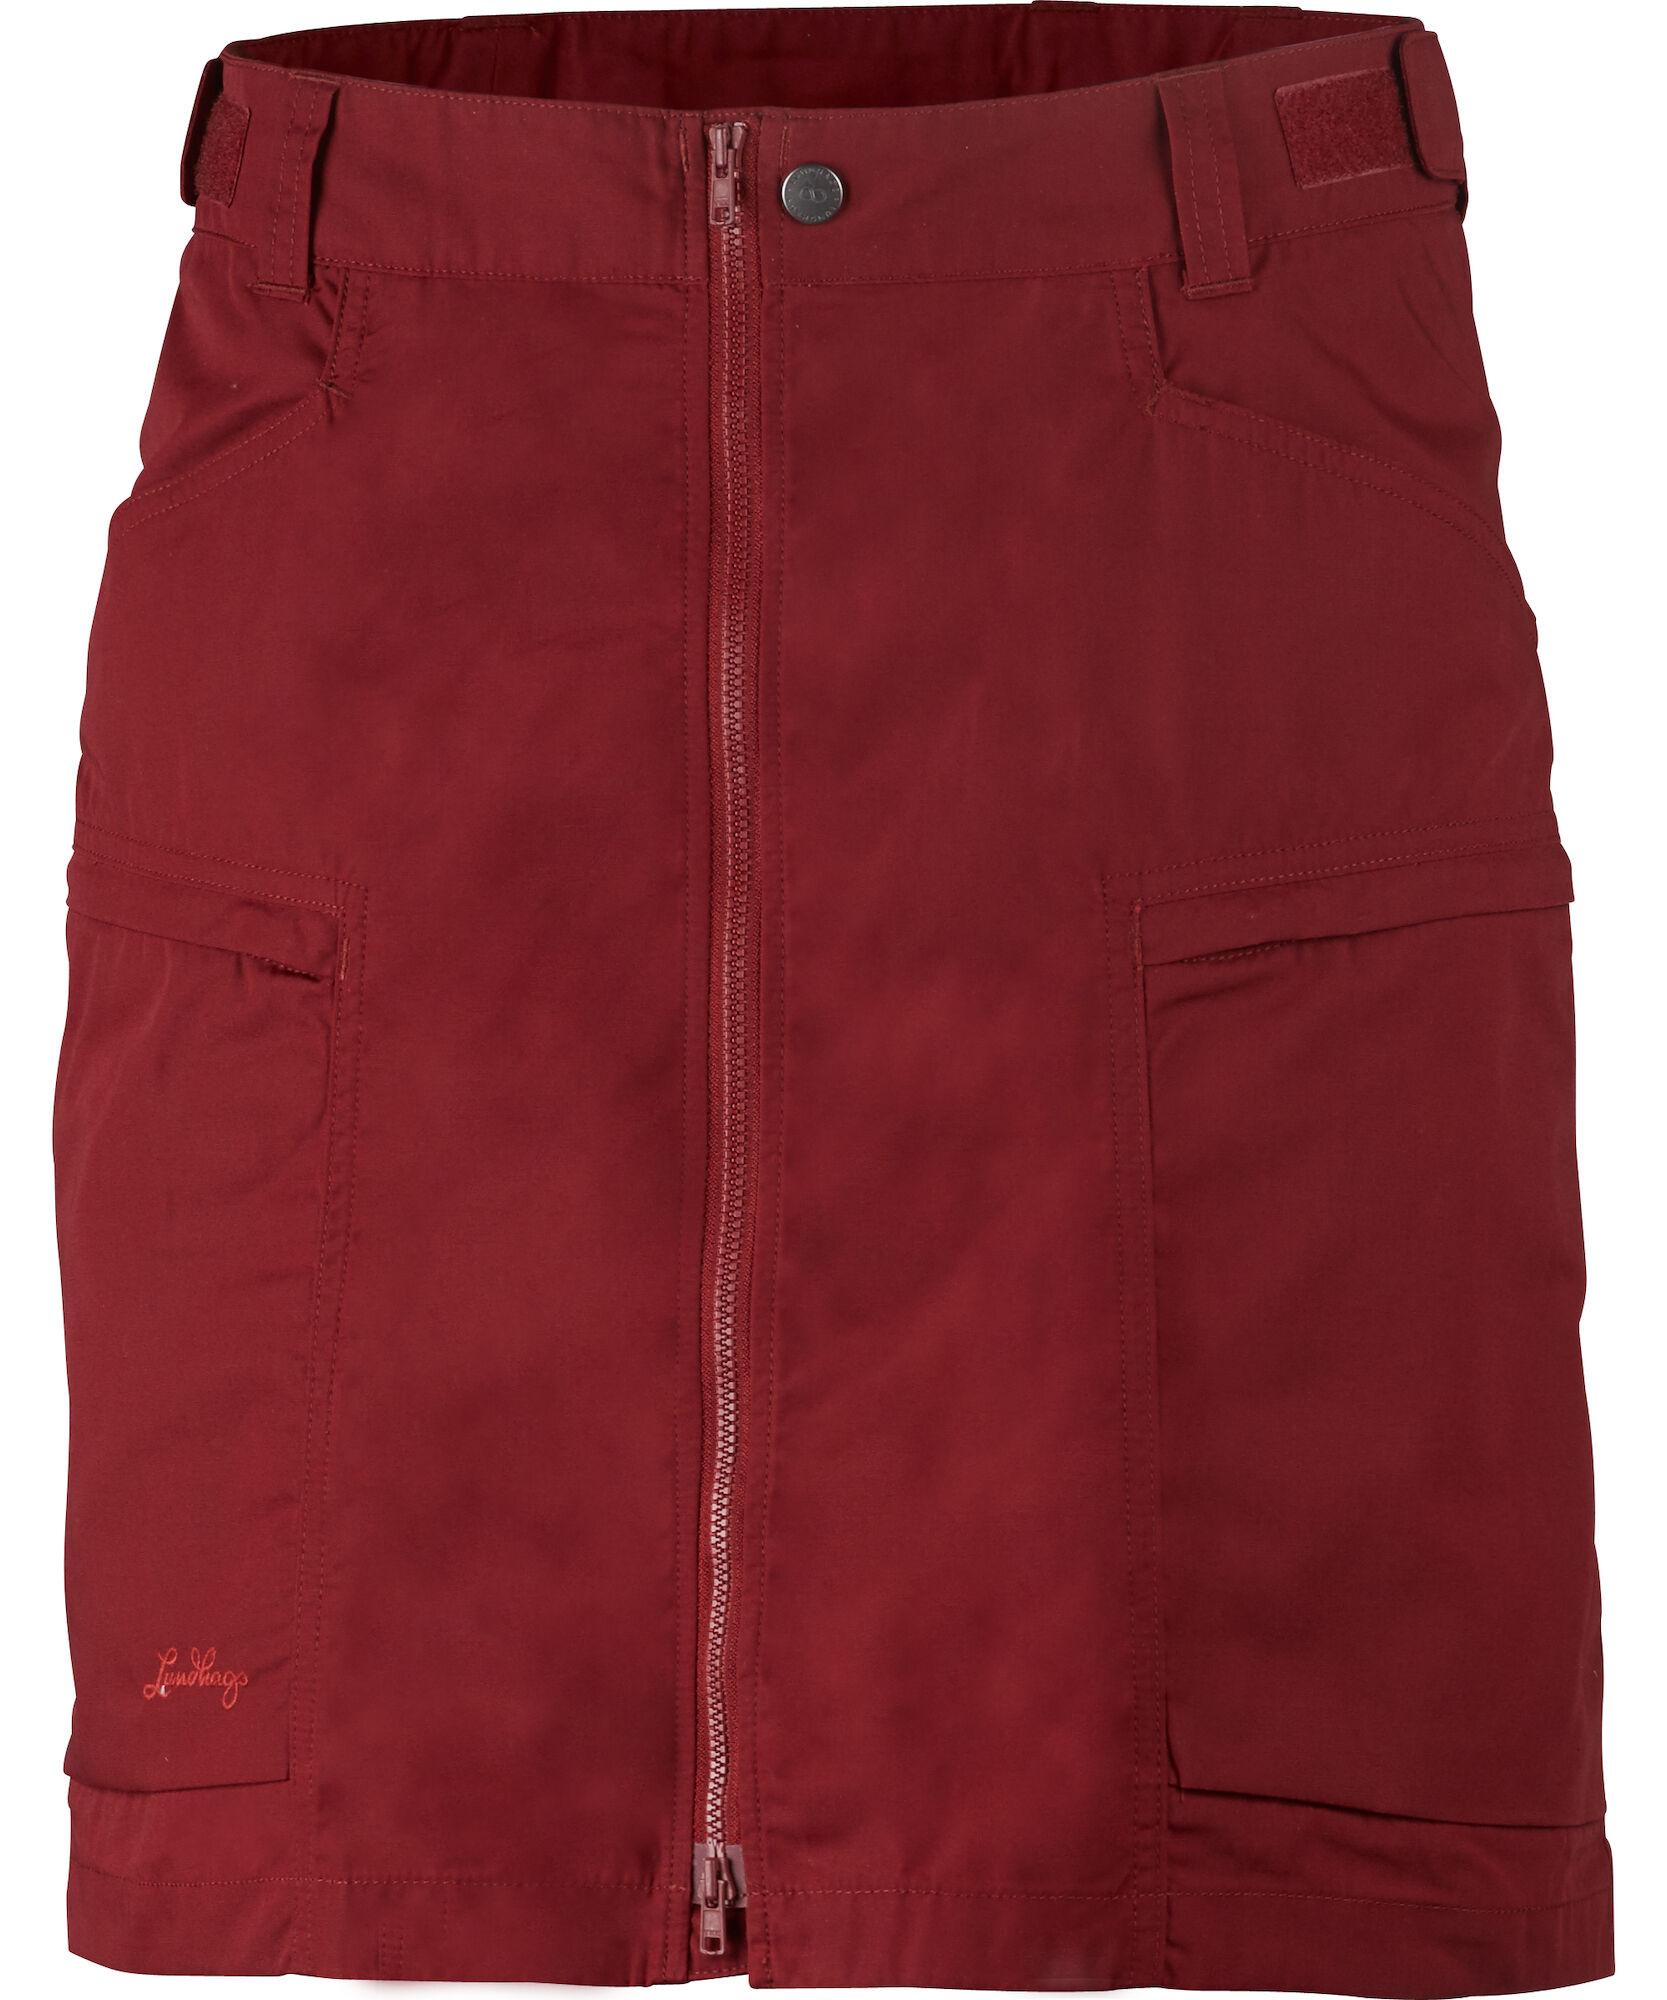 Tiven II Ws Skirt